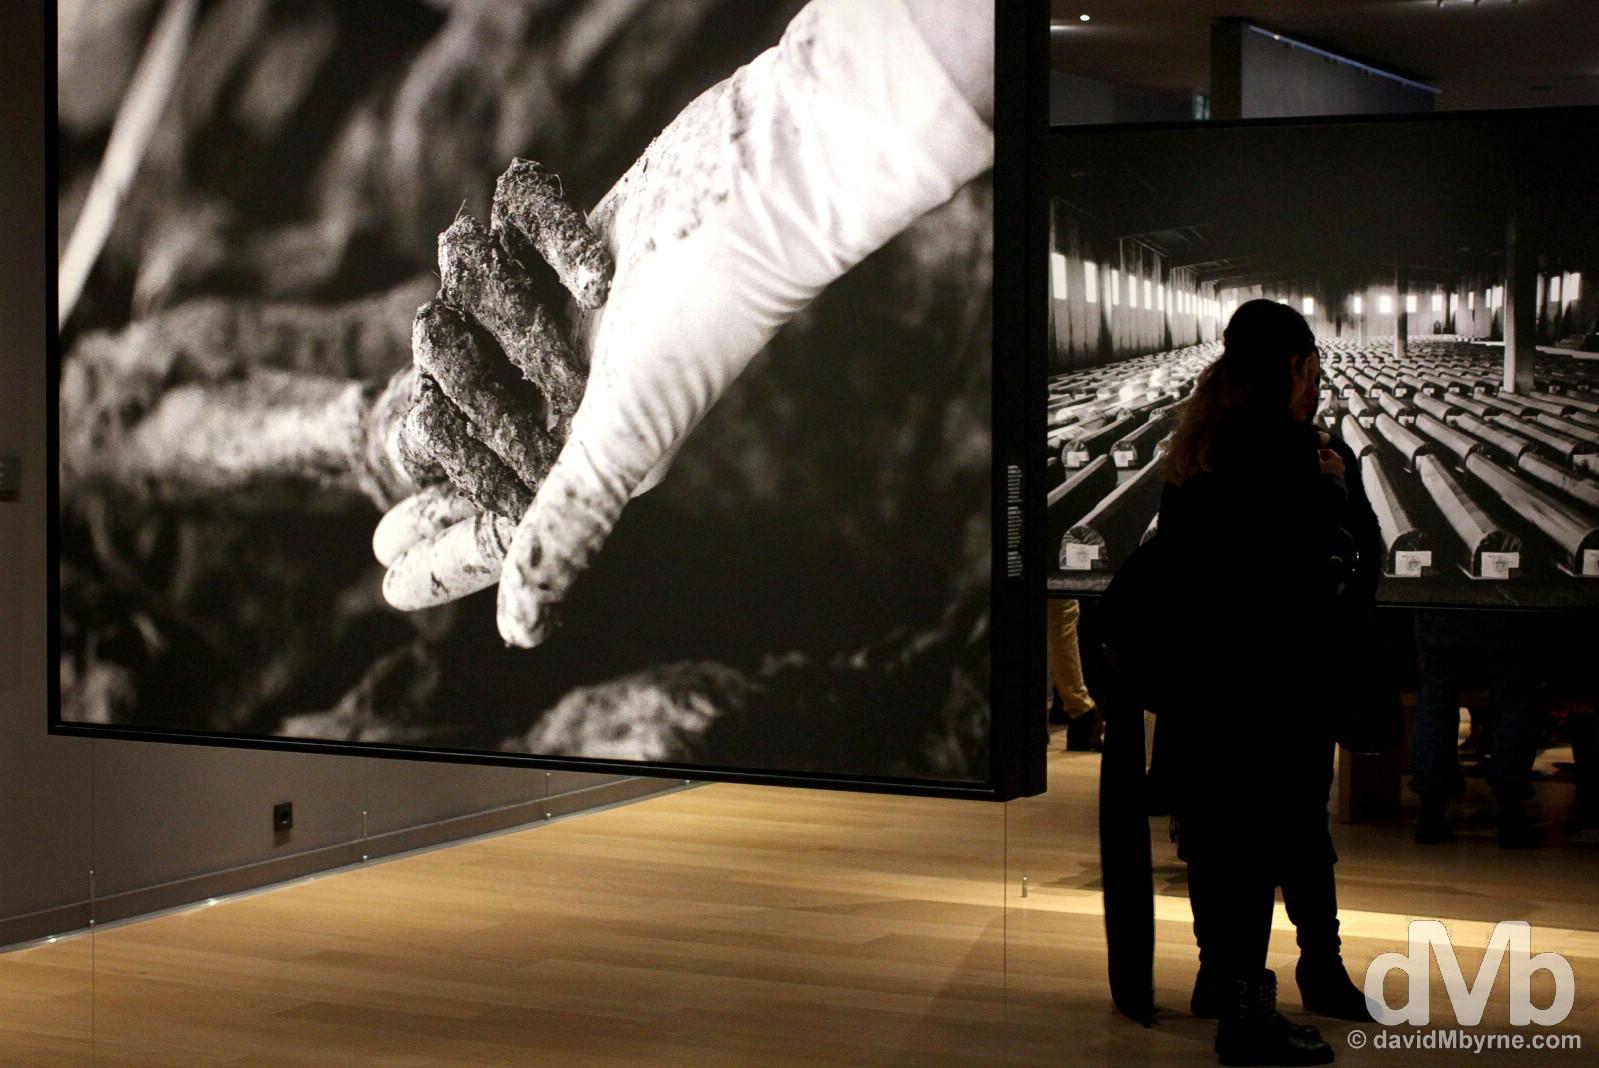 Srebrenica Massacre of the Bosnian War exhibition in Sarajevo, Bosnia & Herzegovina. April 5, 2015.